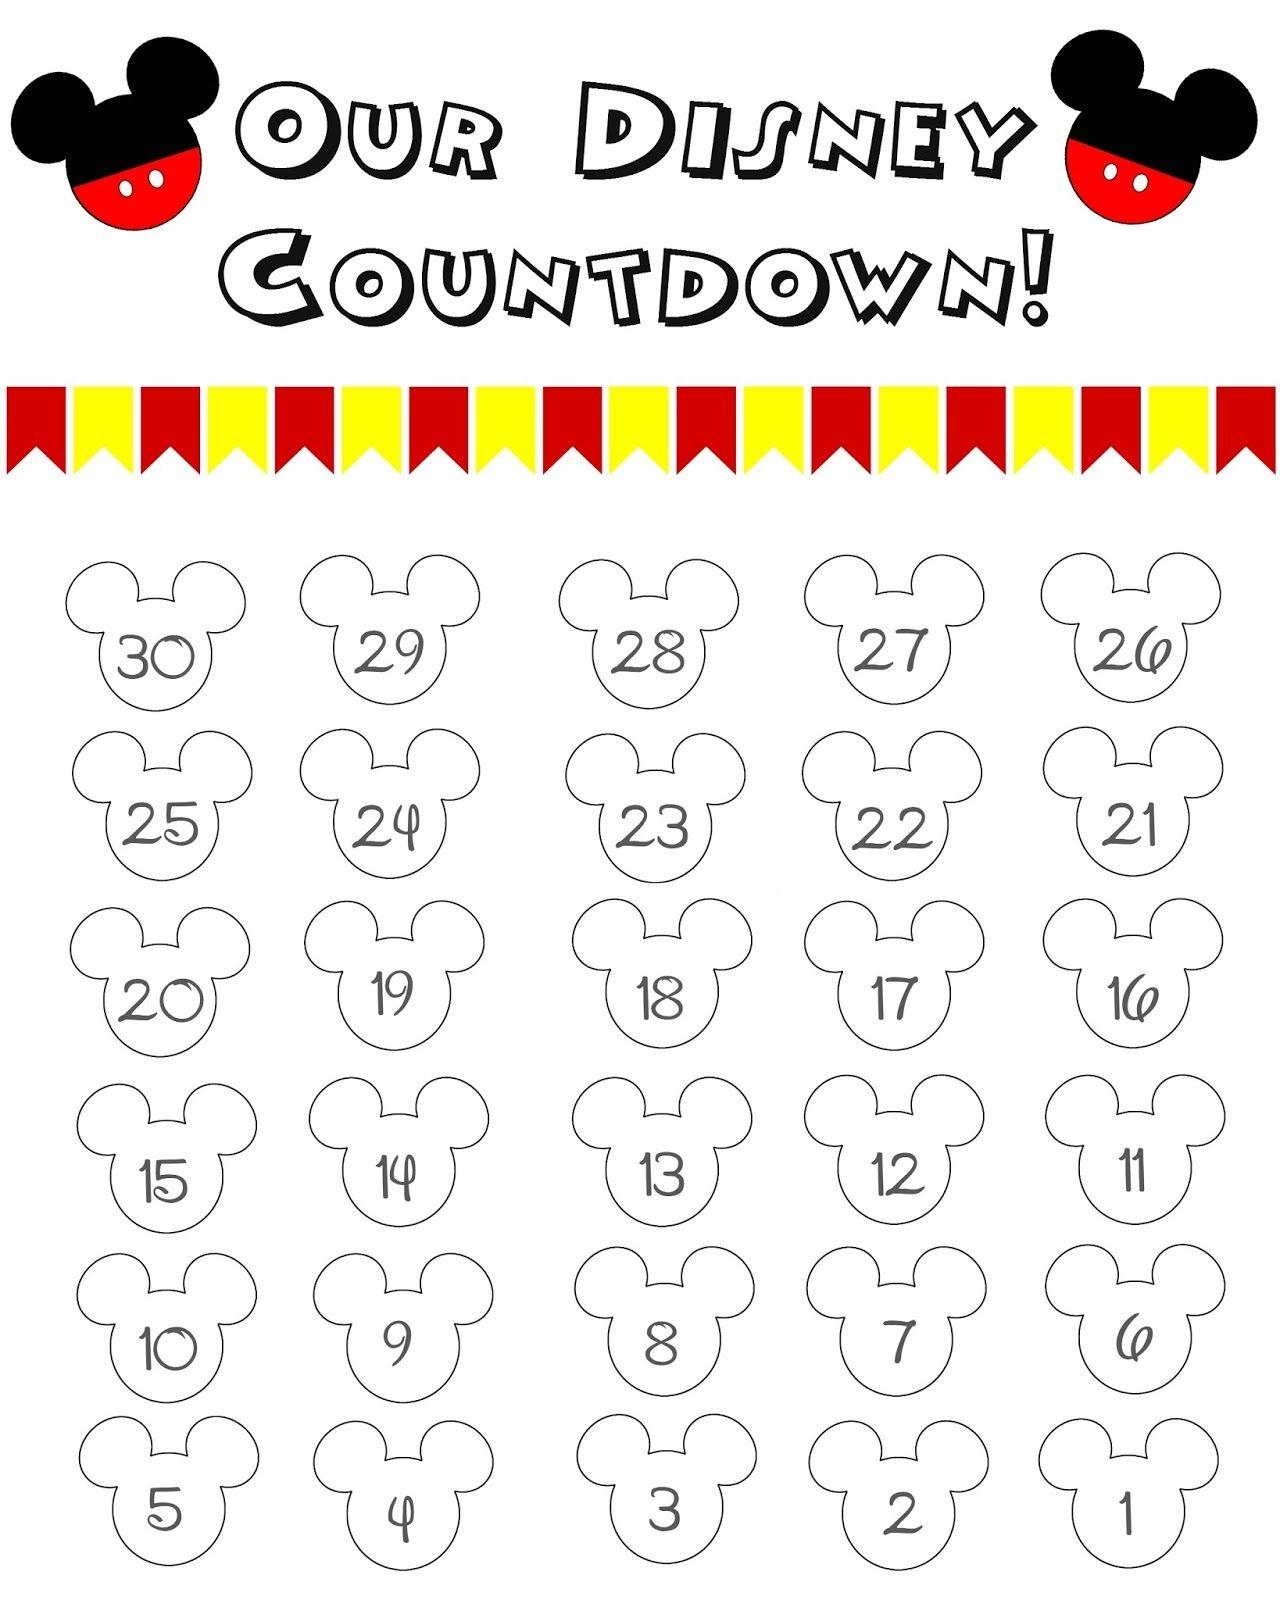 10 Fun Printable Disney Countdown Calendars | Kittybabylove